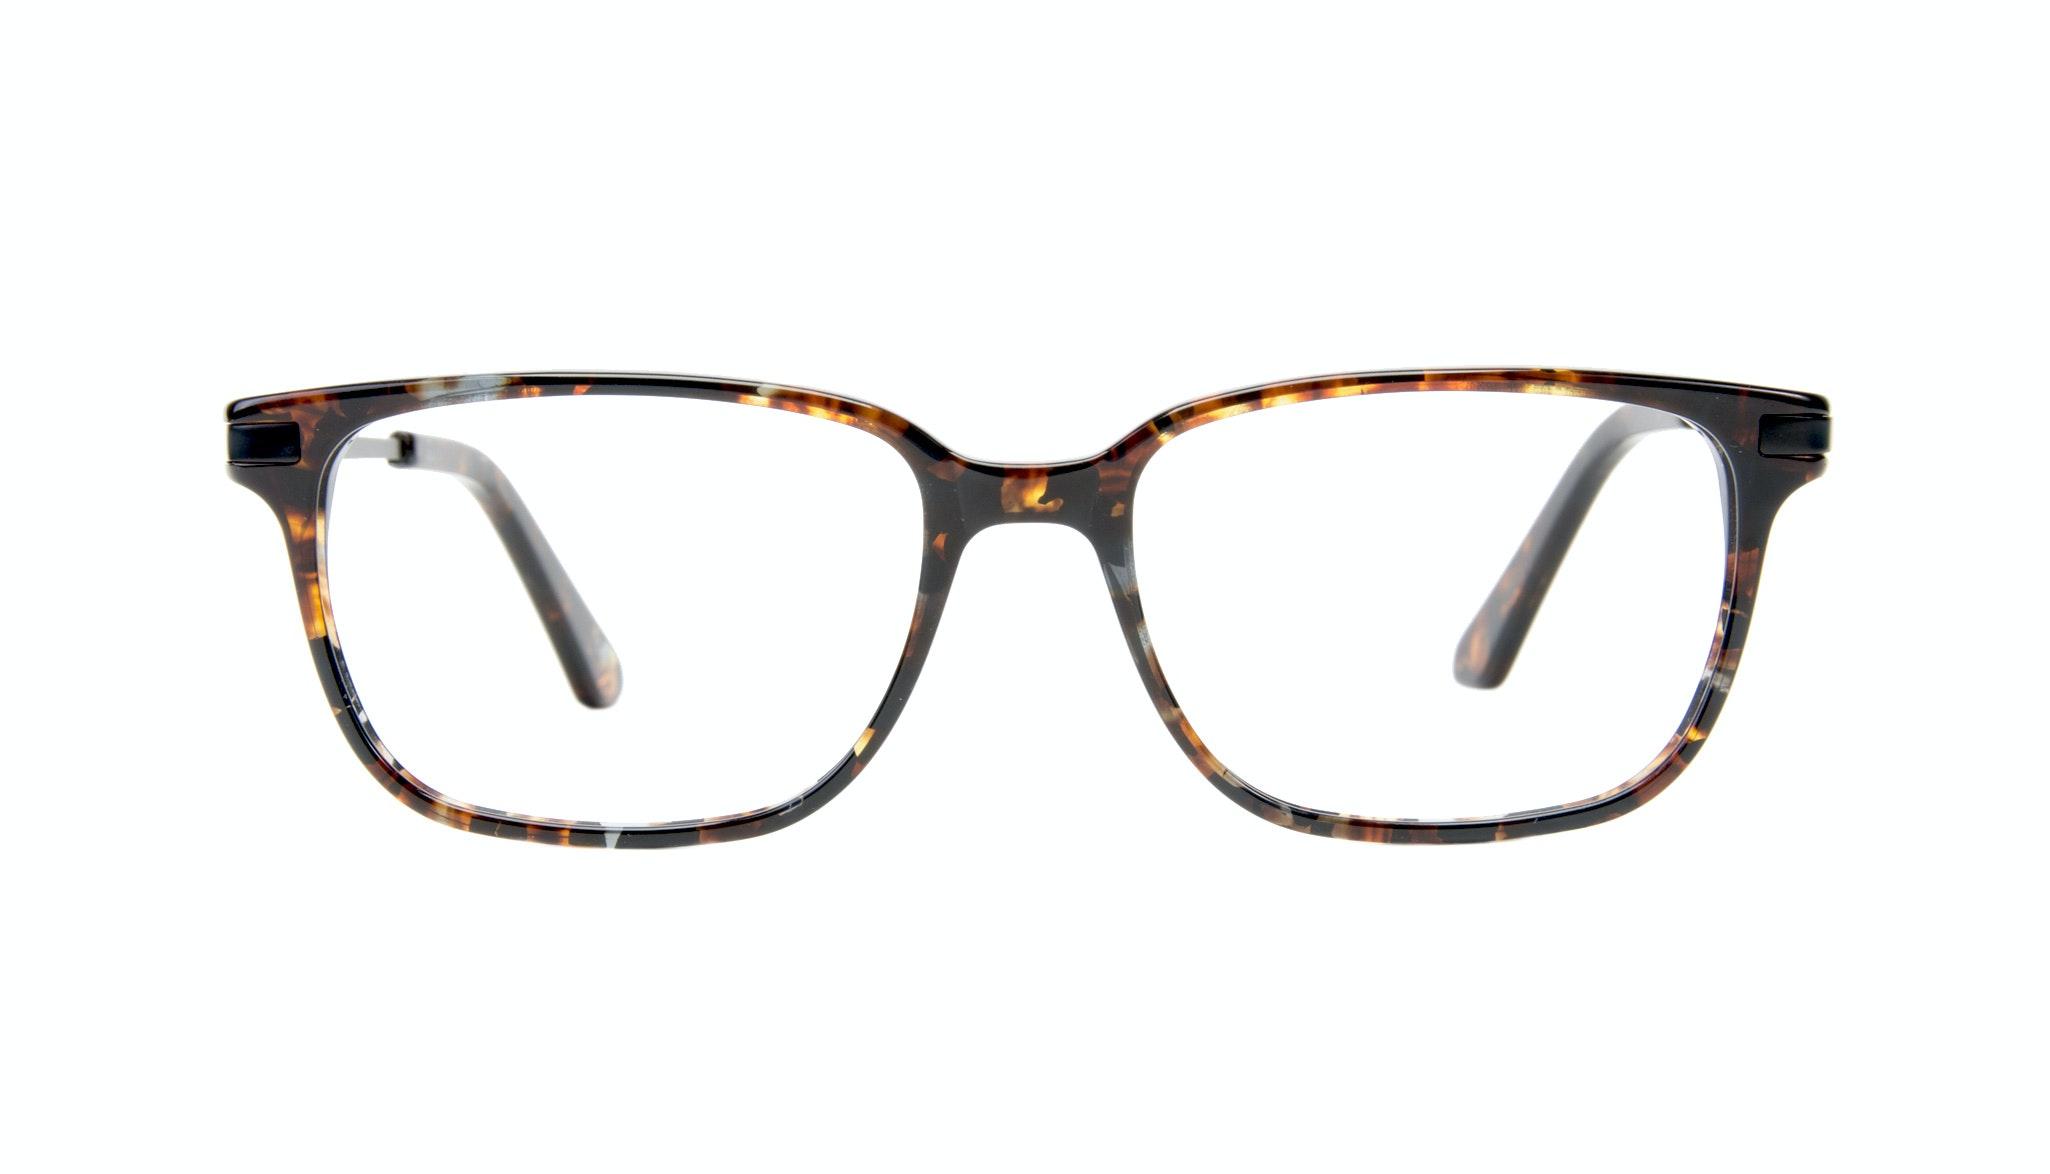 Lunettes tendance Rectangle Optiques Hommes Trade Mahogany